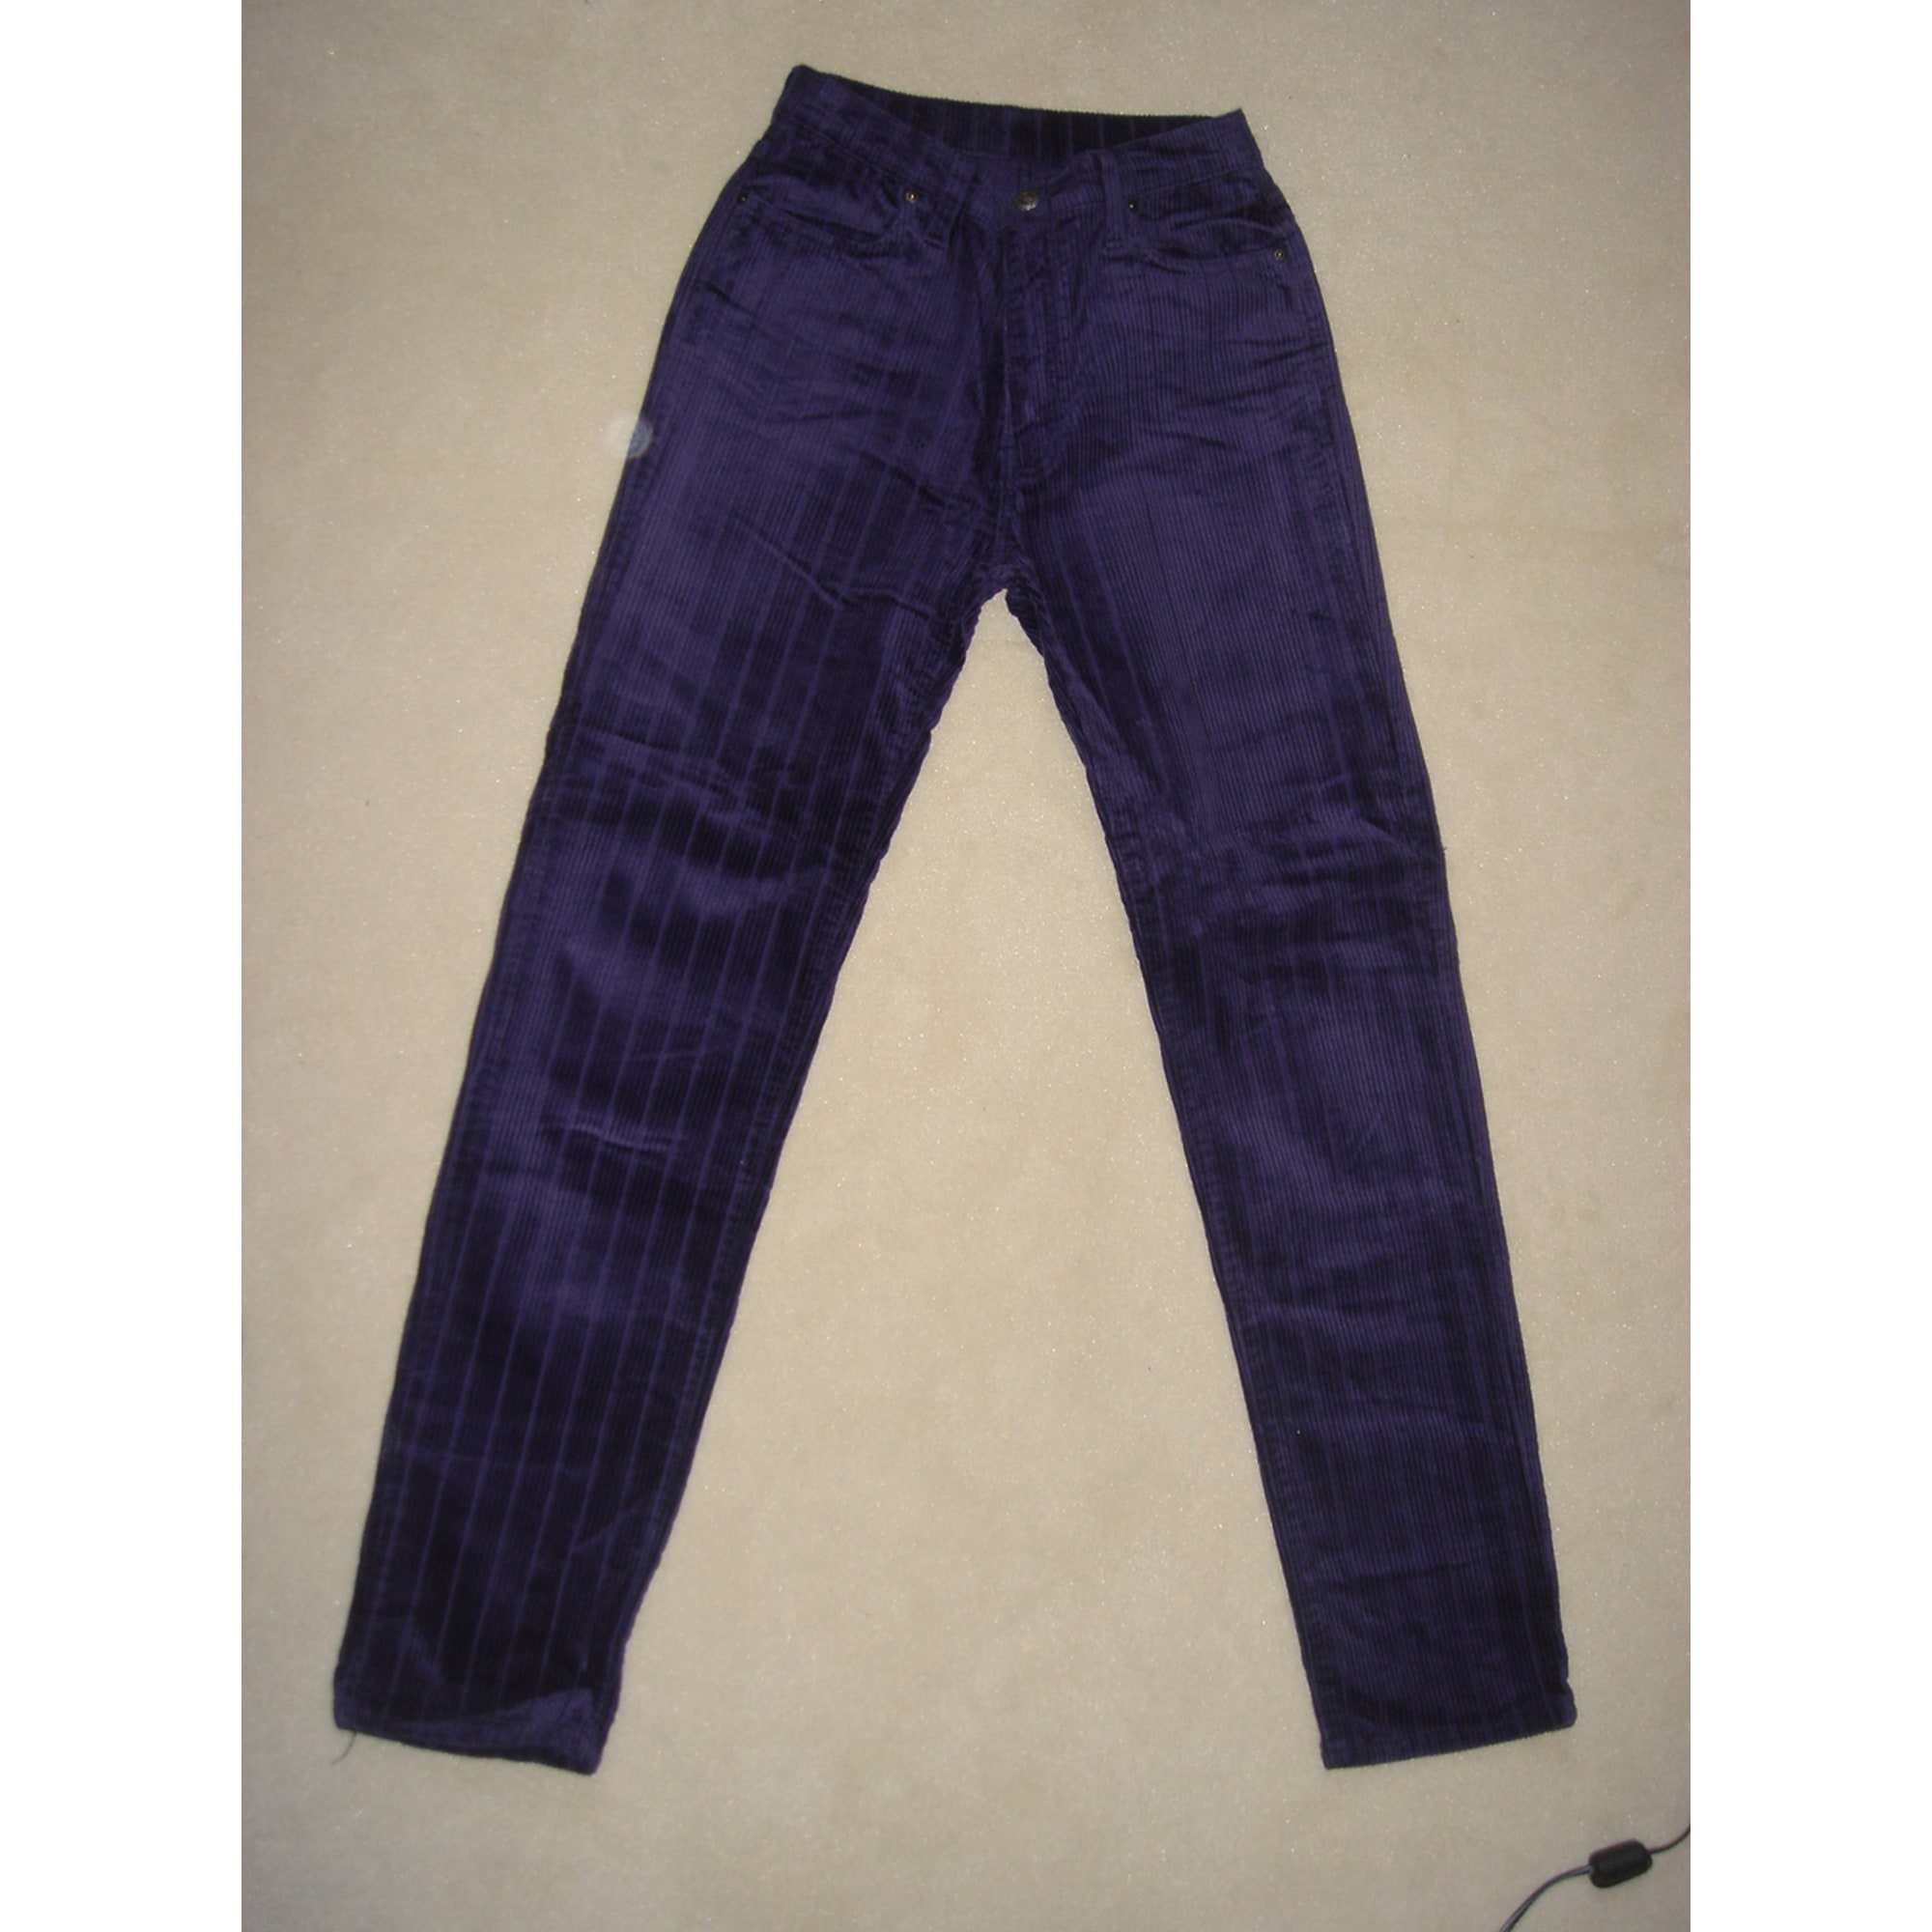 Pantalon TEDDY SMITH Violet, mauve, lavande